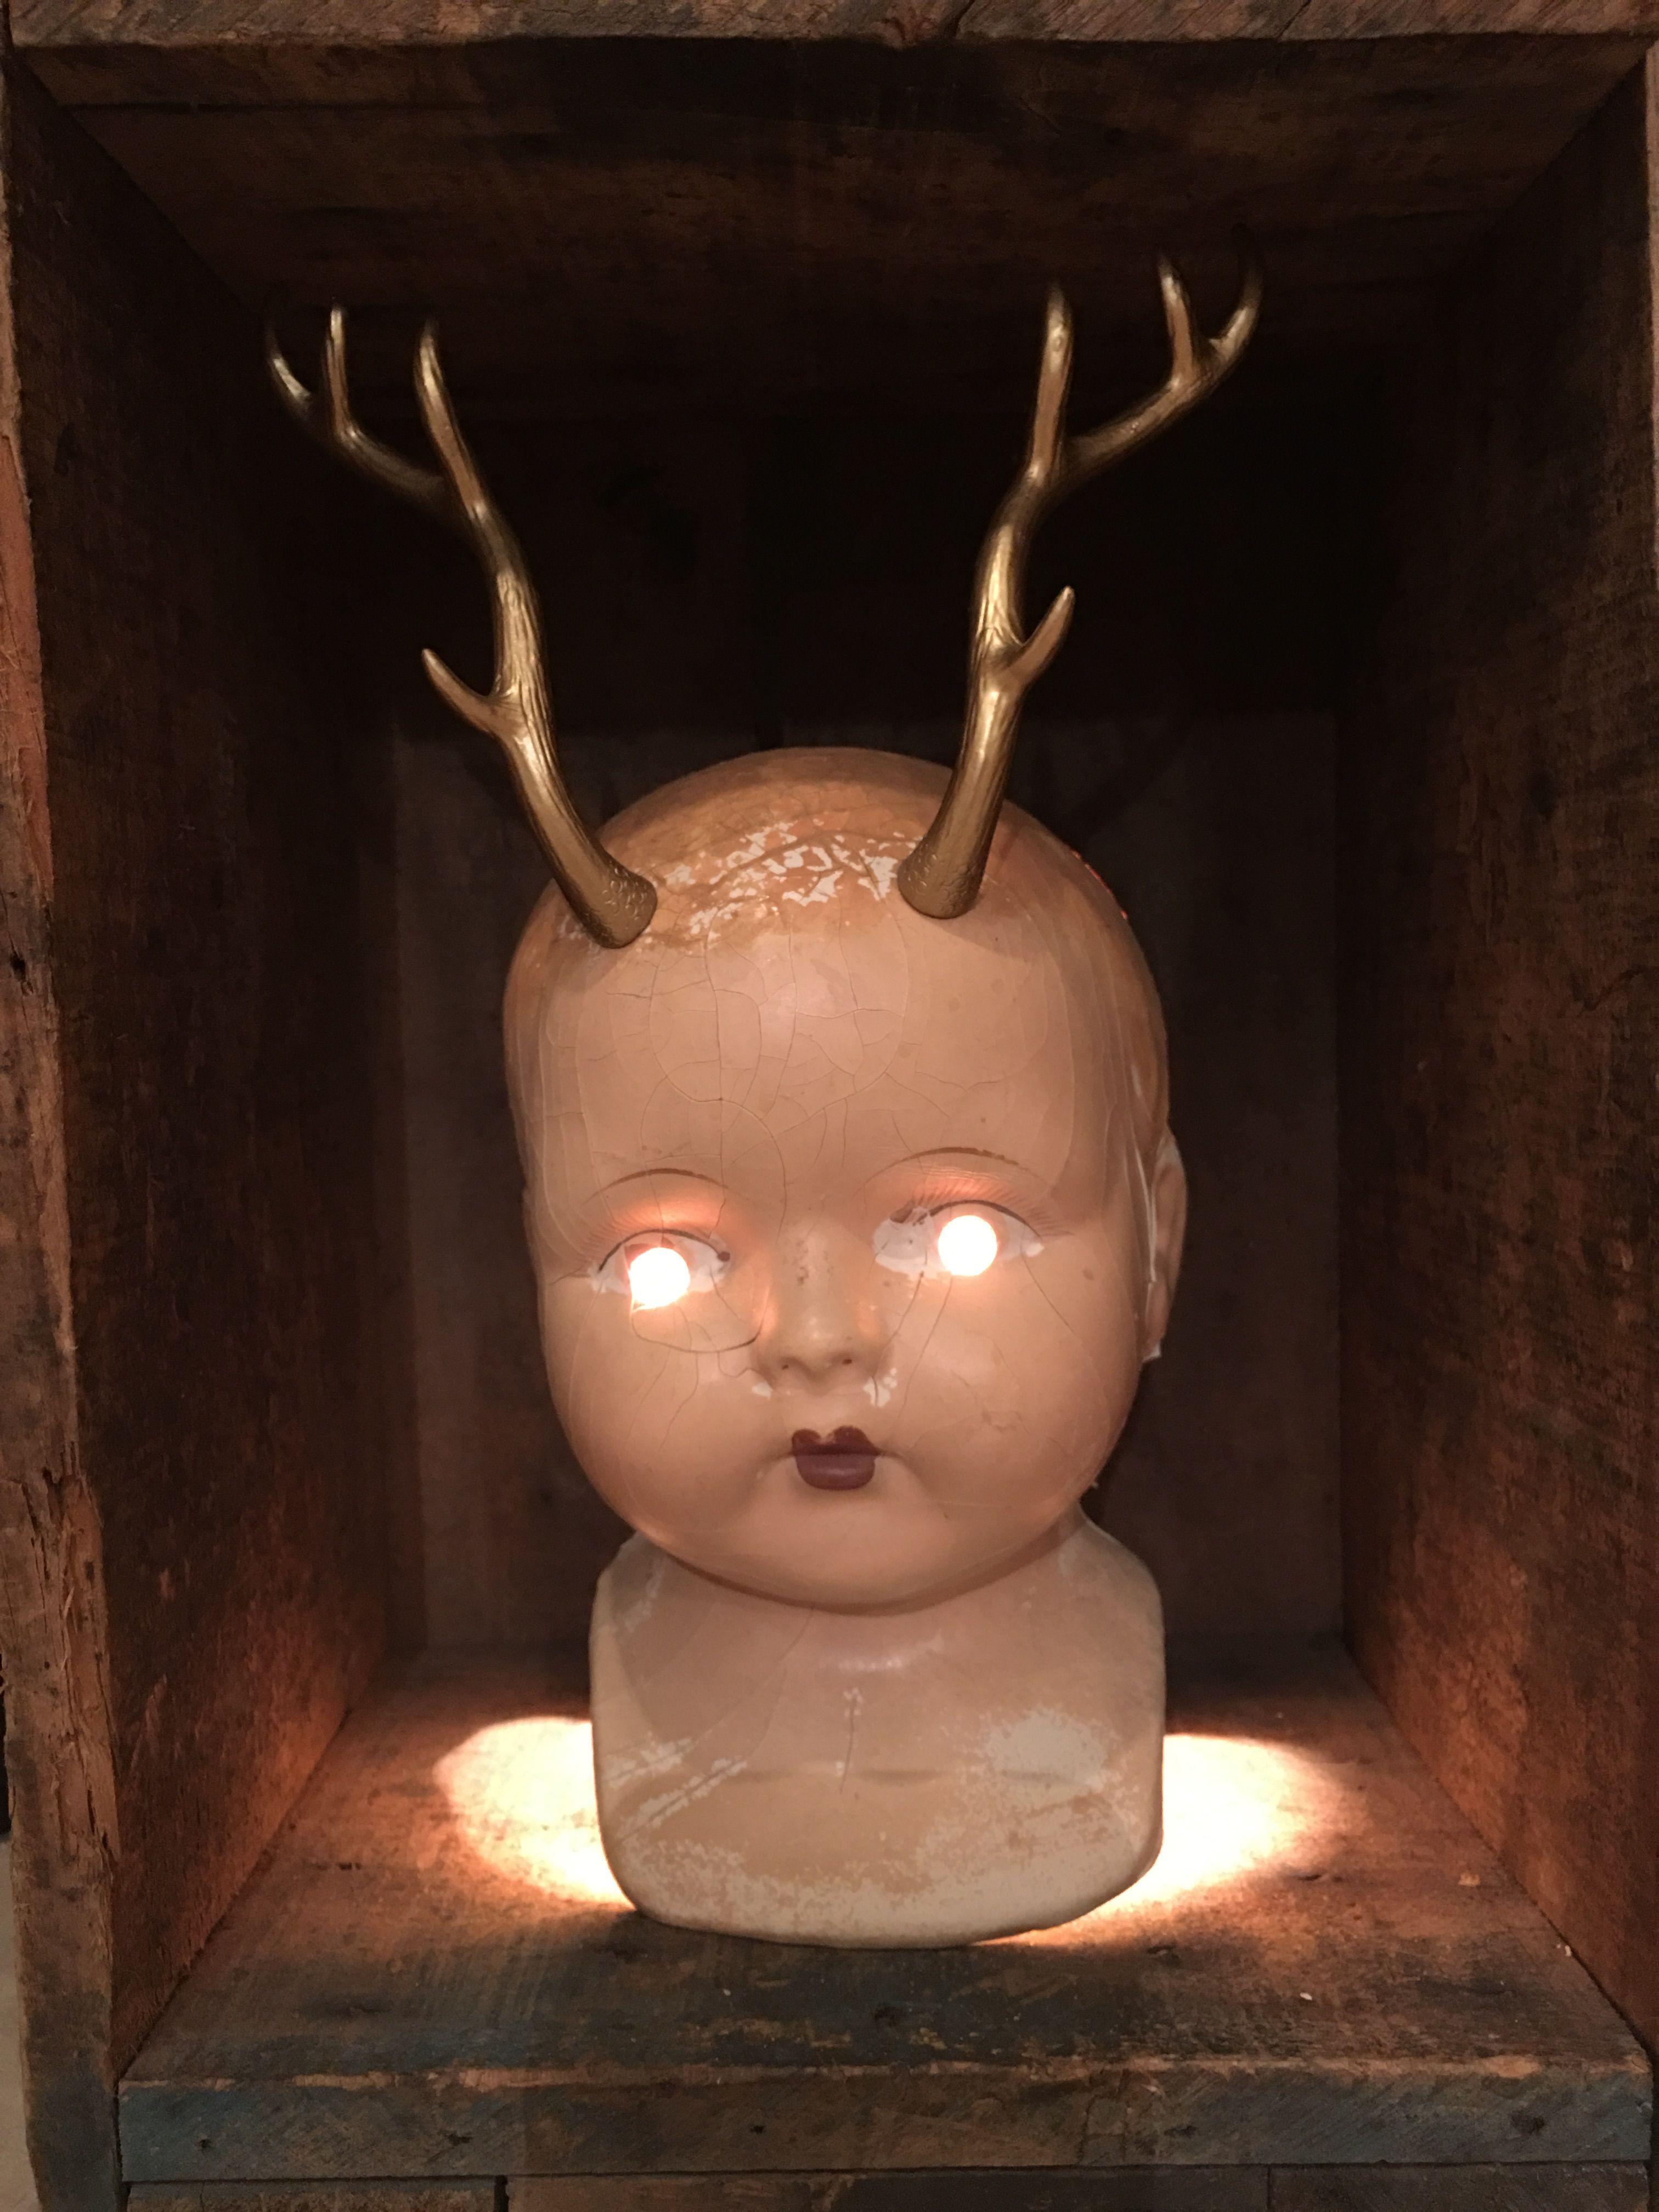 Creepy Baby Doll Head Lamp Antlers | Creepy baby dolls, Scary ...